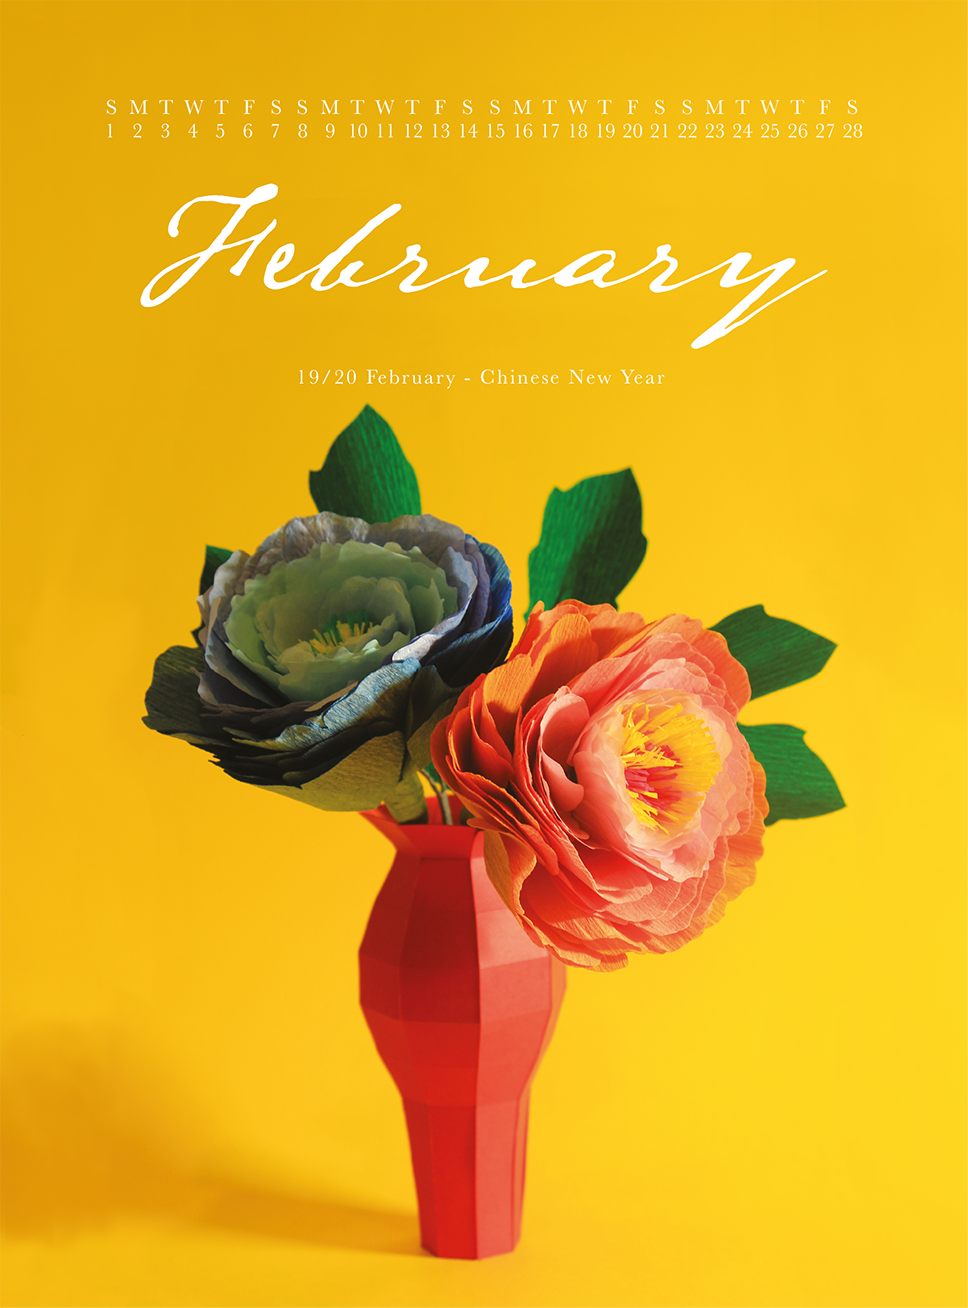 Website_Pencilled_2015Calendar_February